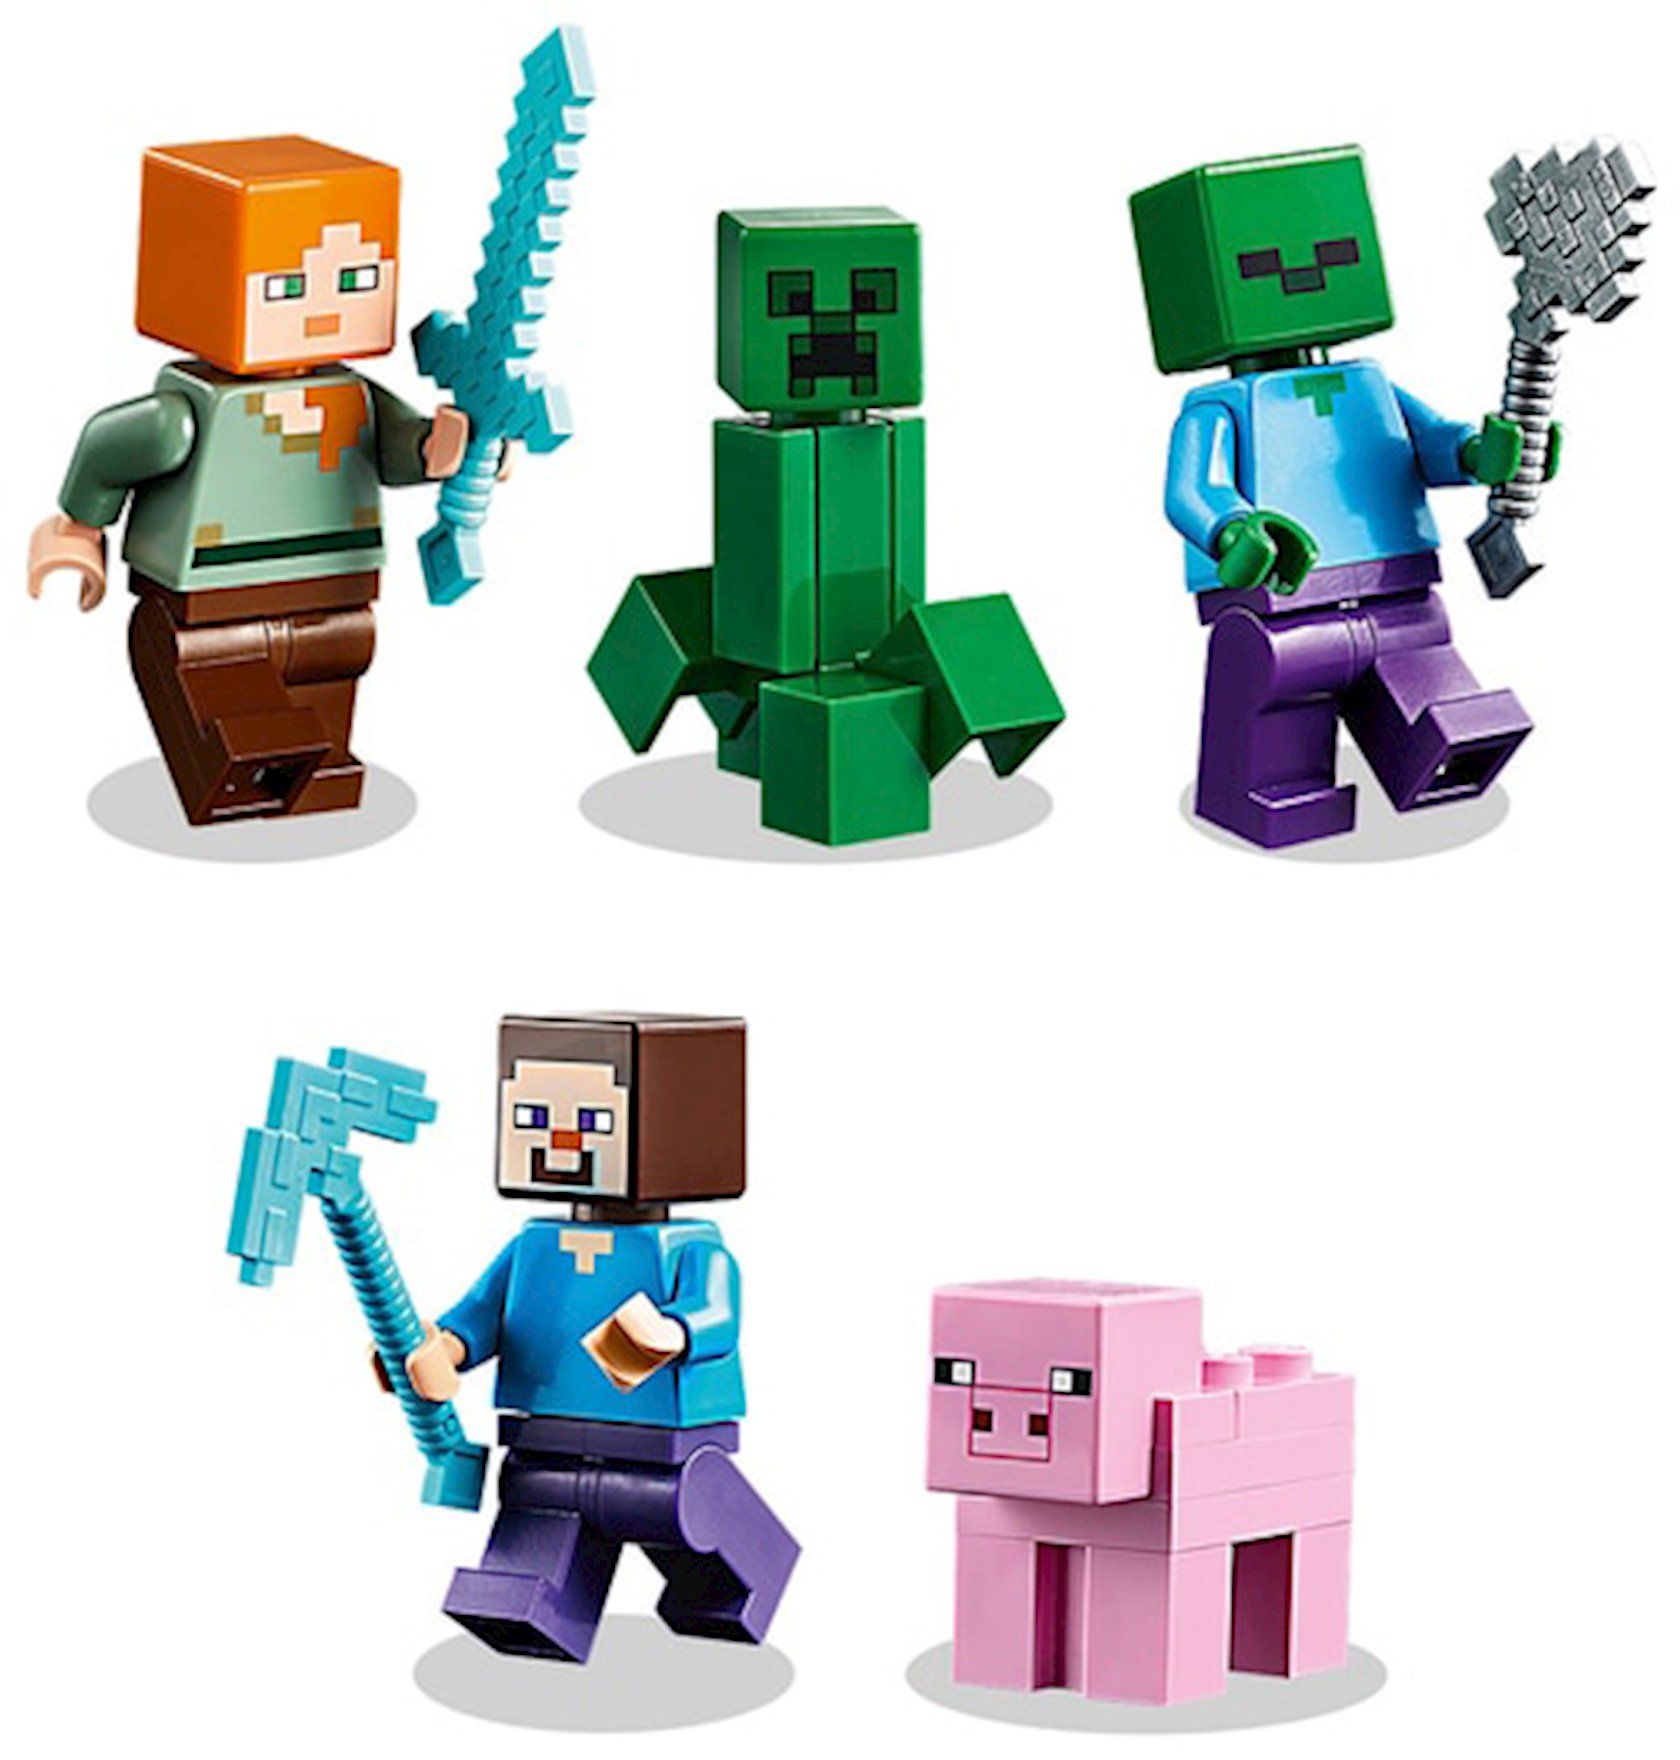 Konstruktor Lego Minecraft Verstak (The Crafting Box) 3.0